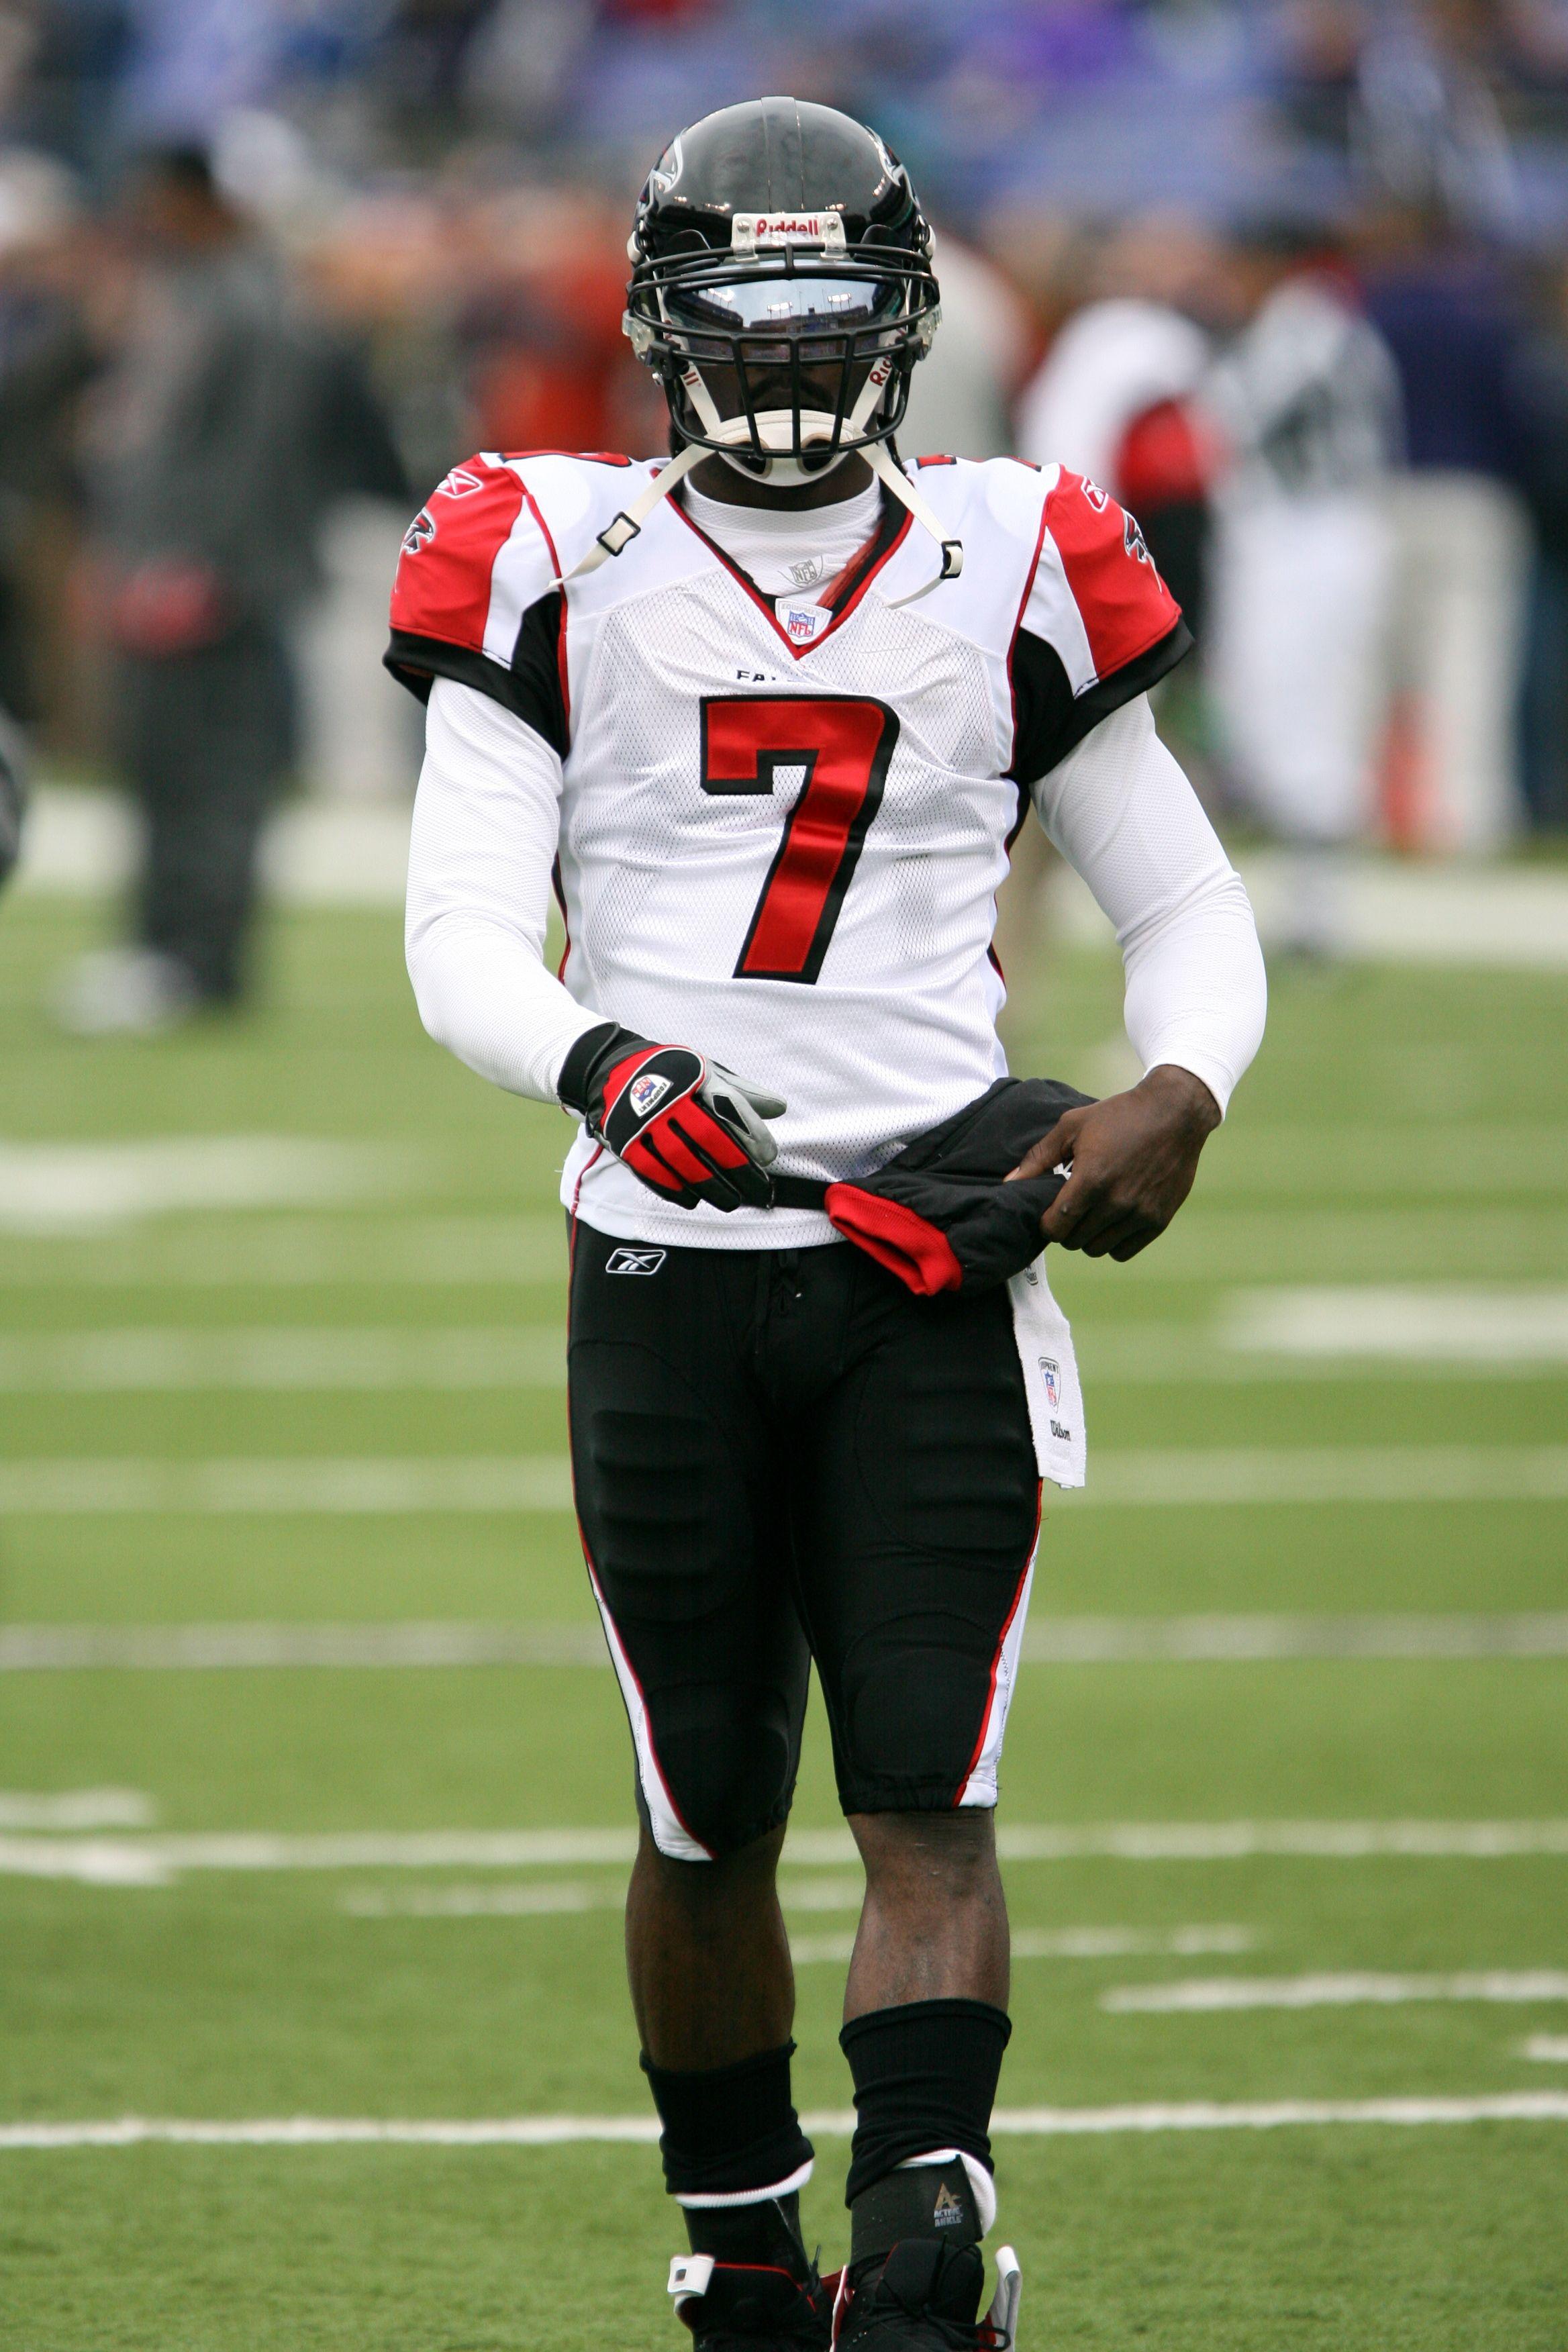 Pin By Bailey Rogers On Udontloveme In 2020 Atlanta Falcons Football Michael Vick Falcons Football